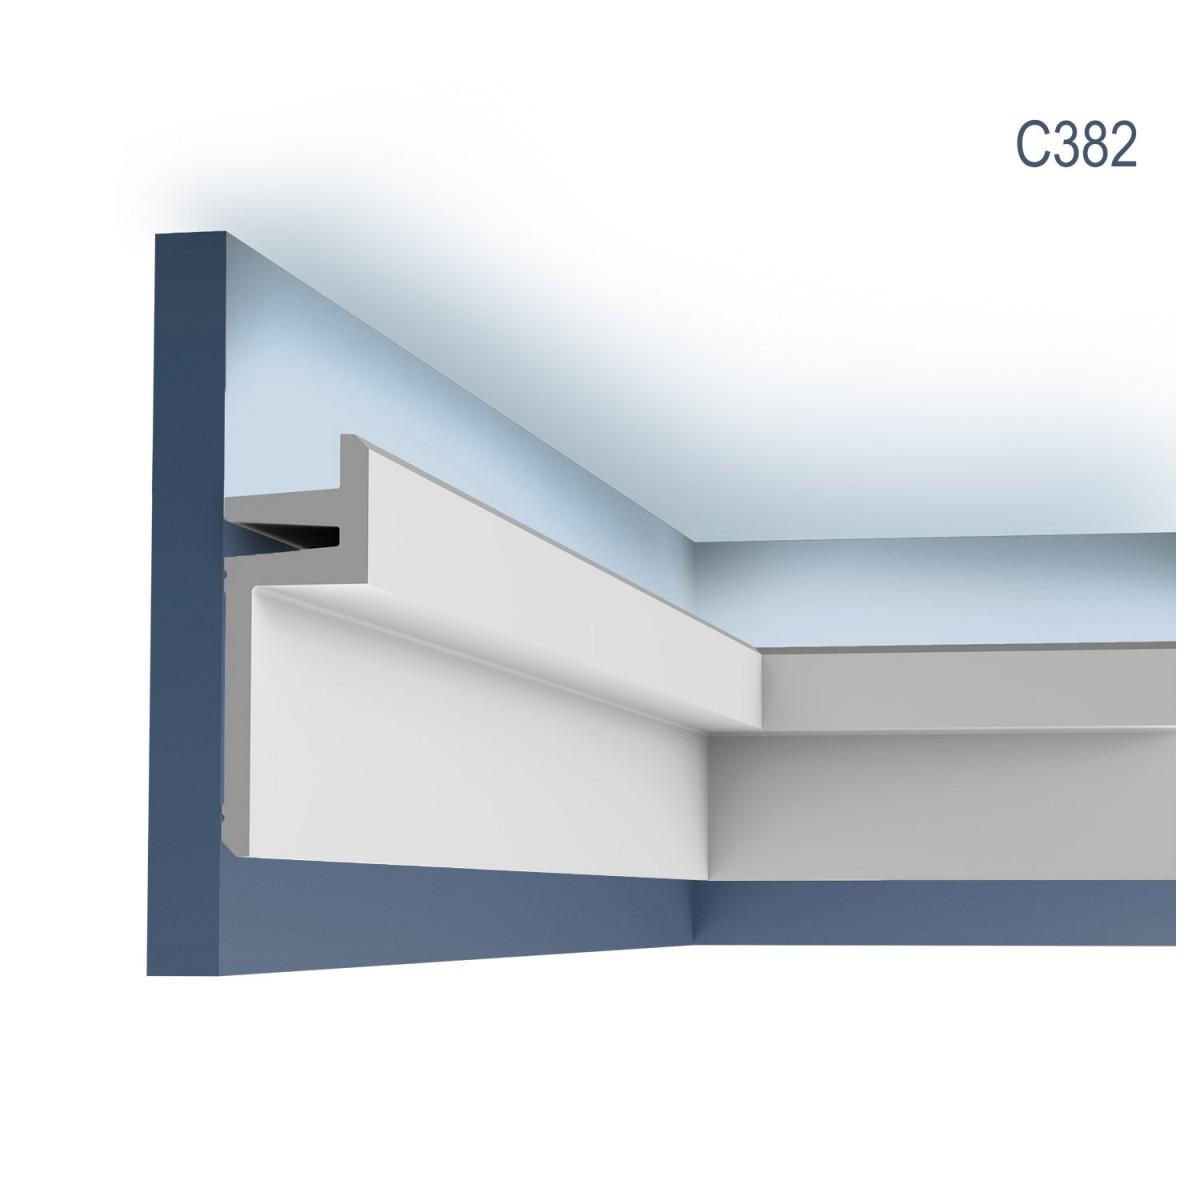 Scafa Modern C382, Dimensiuni: 200 X 14 X 5 cm, Orac Decor